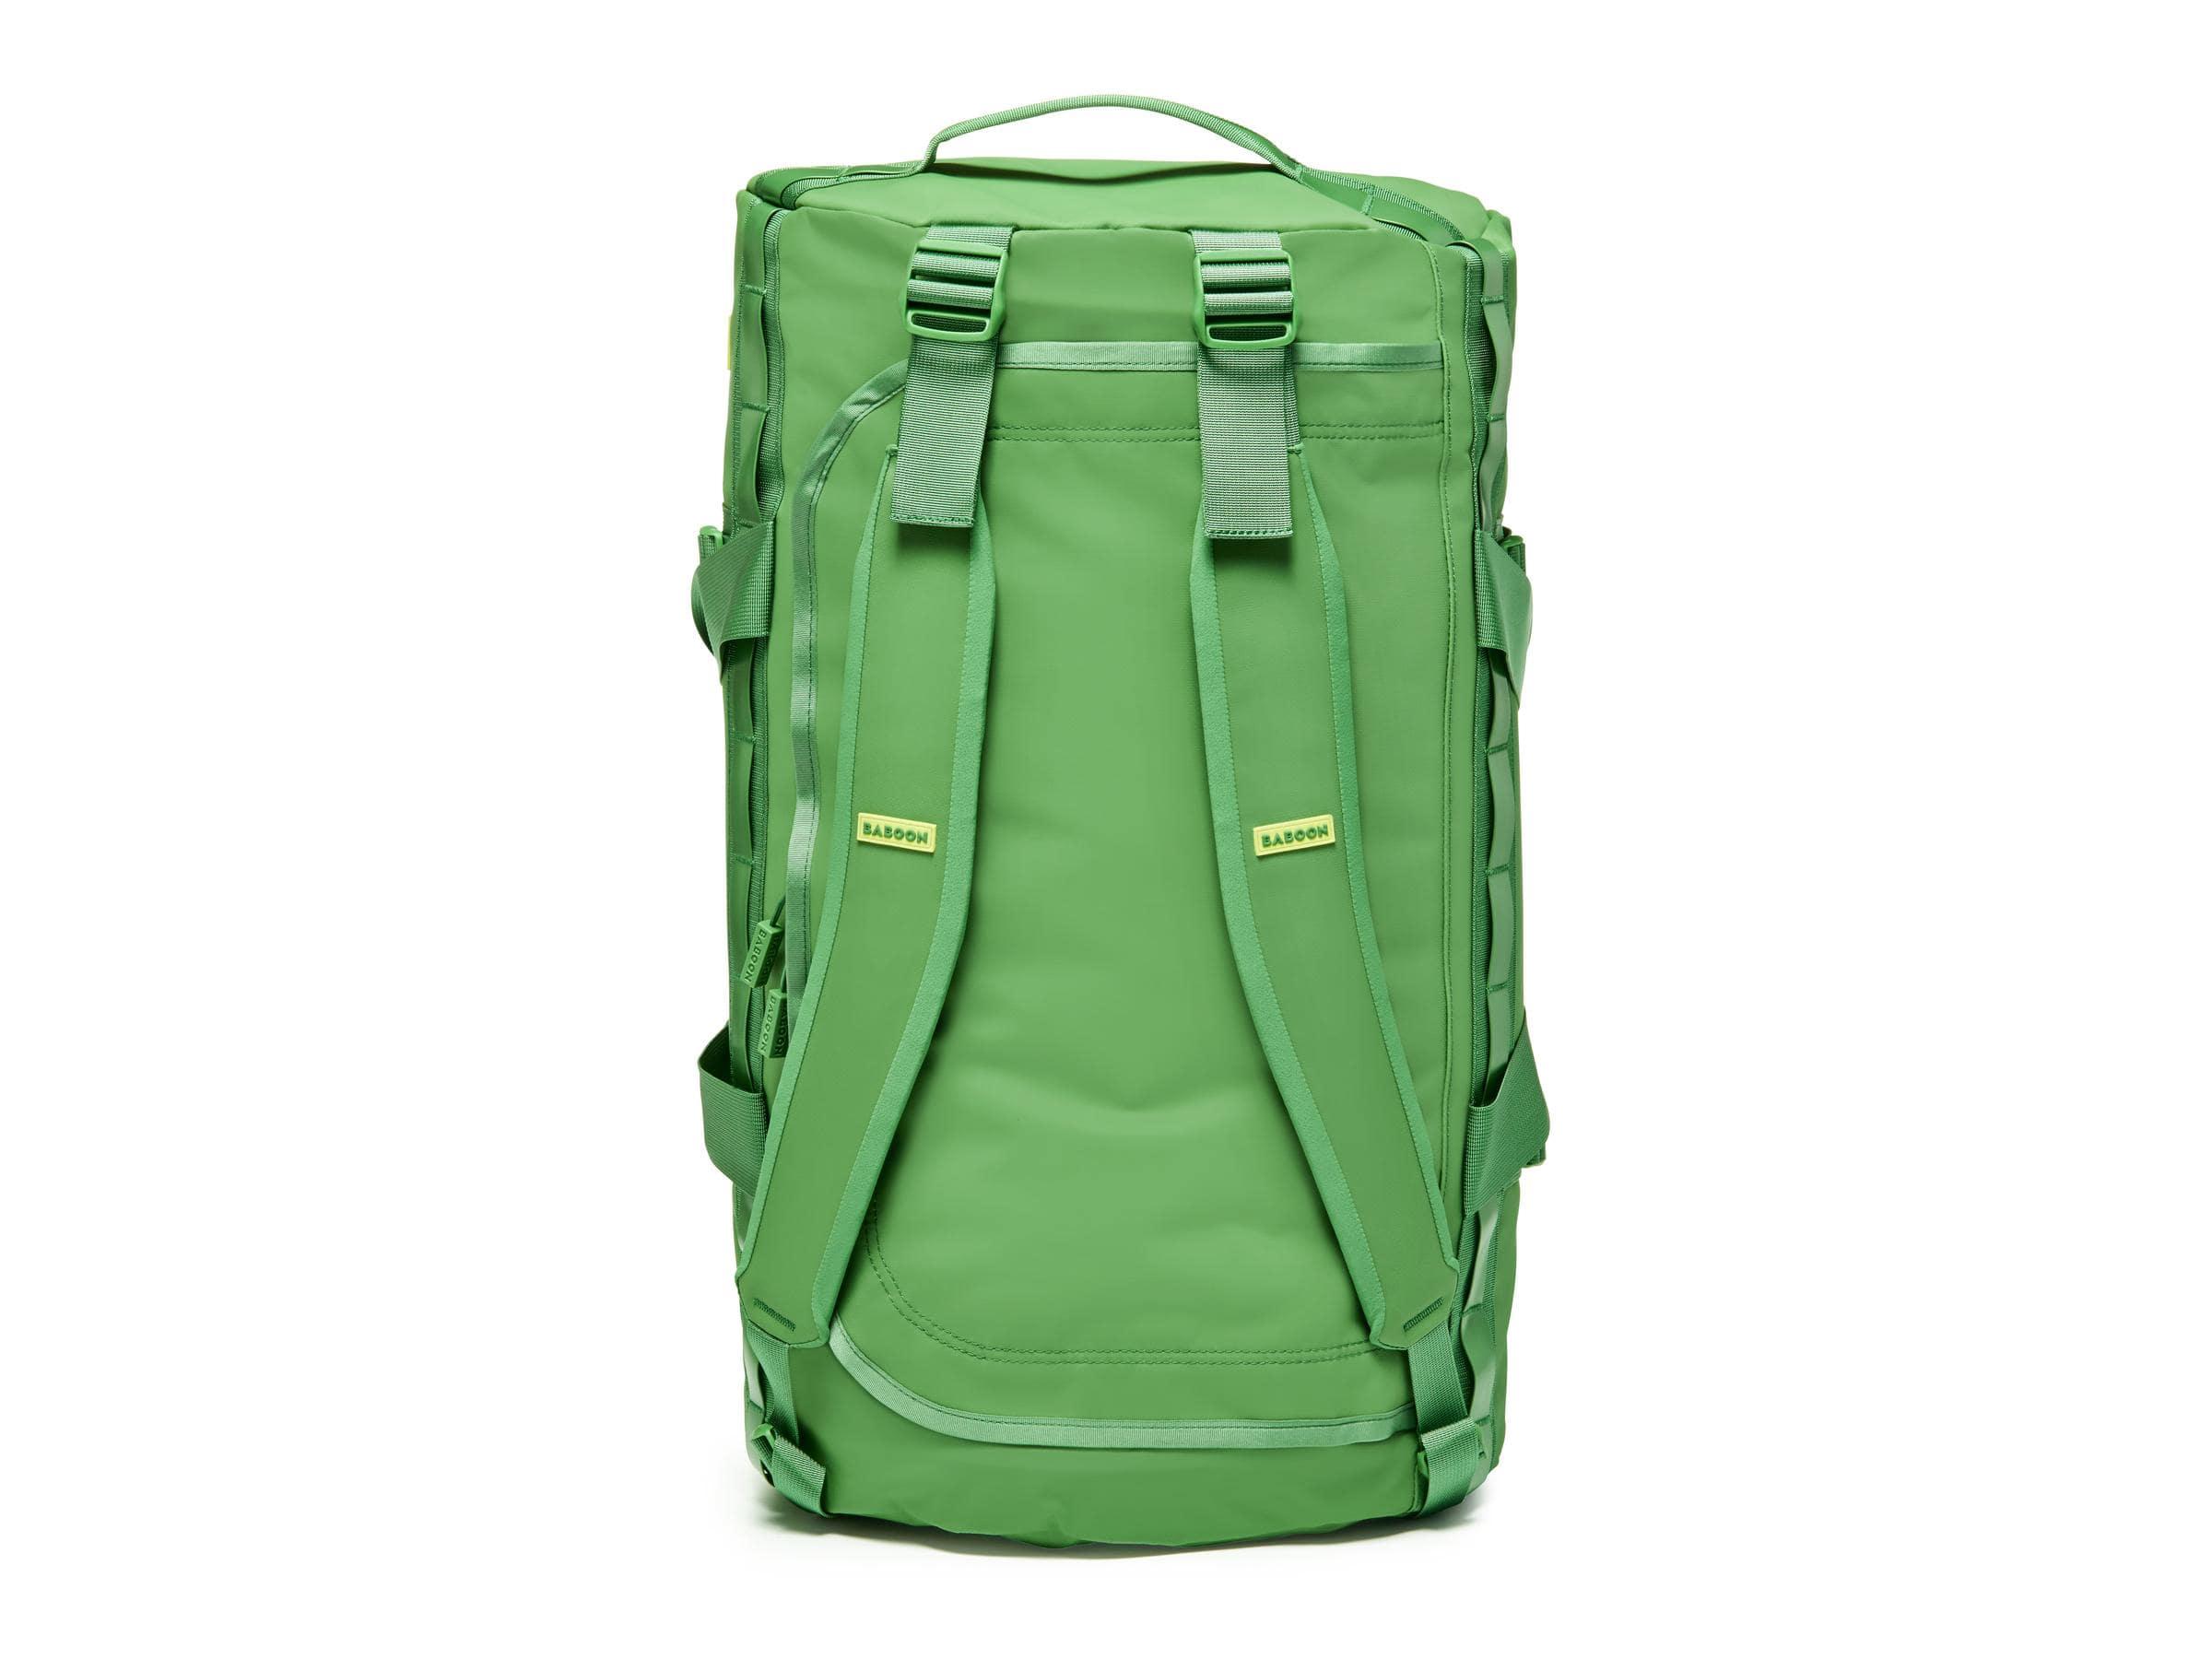 baboon-green-tigernaut-go-bag-large-03-38379